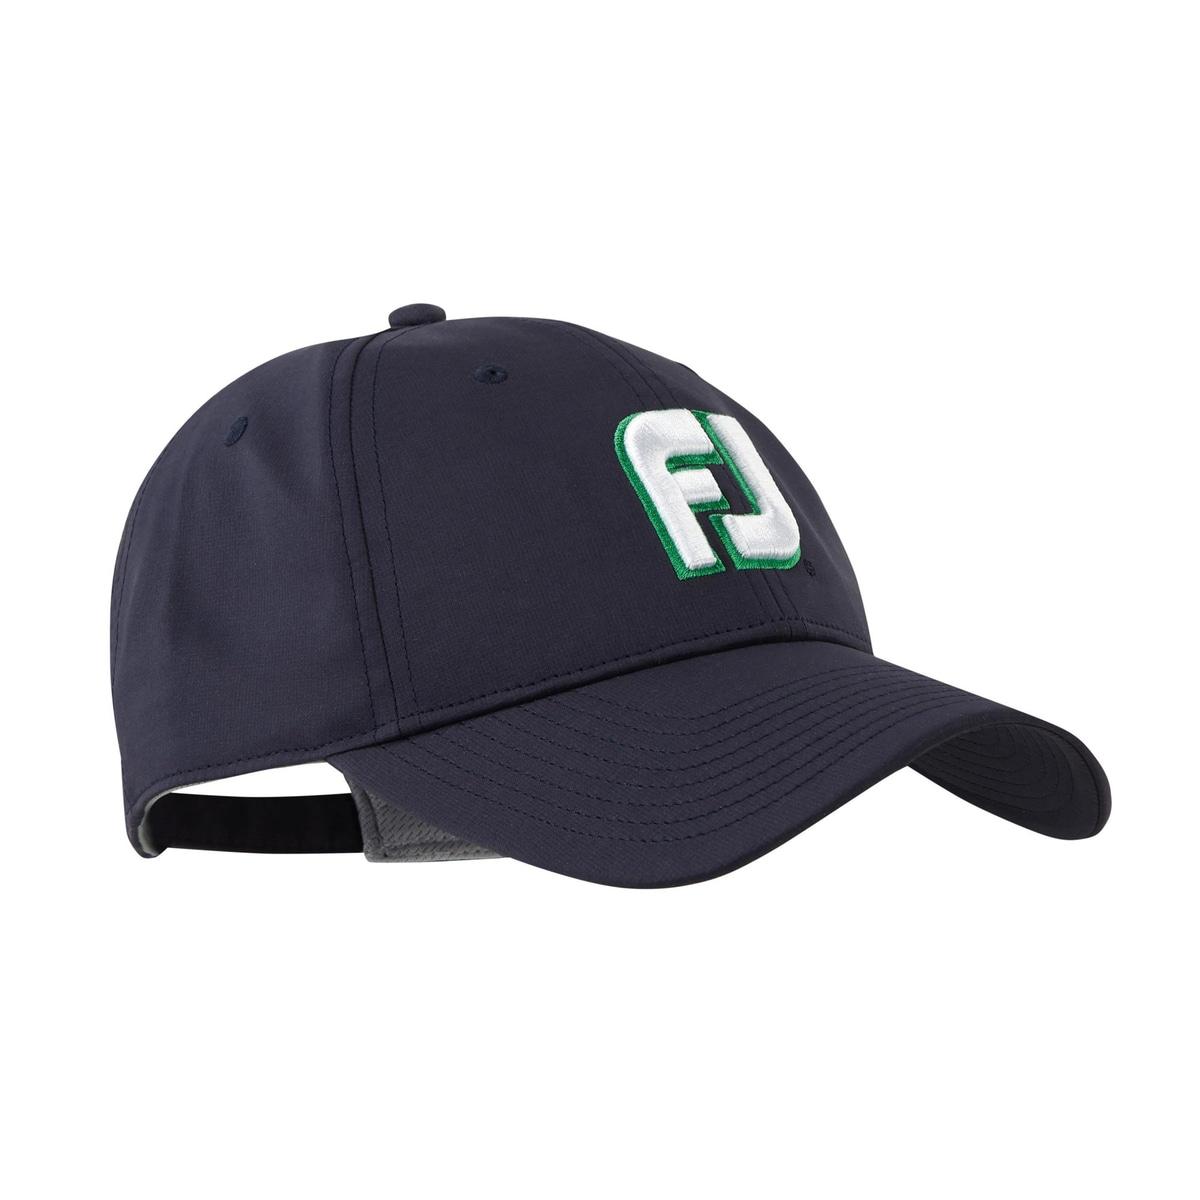 FJ Fashion Cap Verstellba